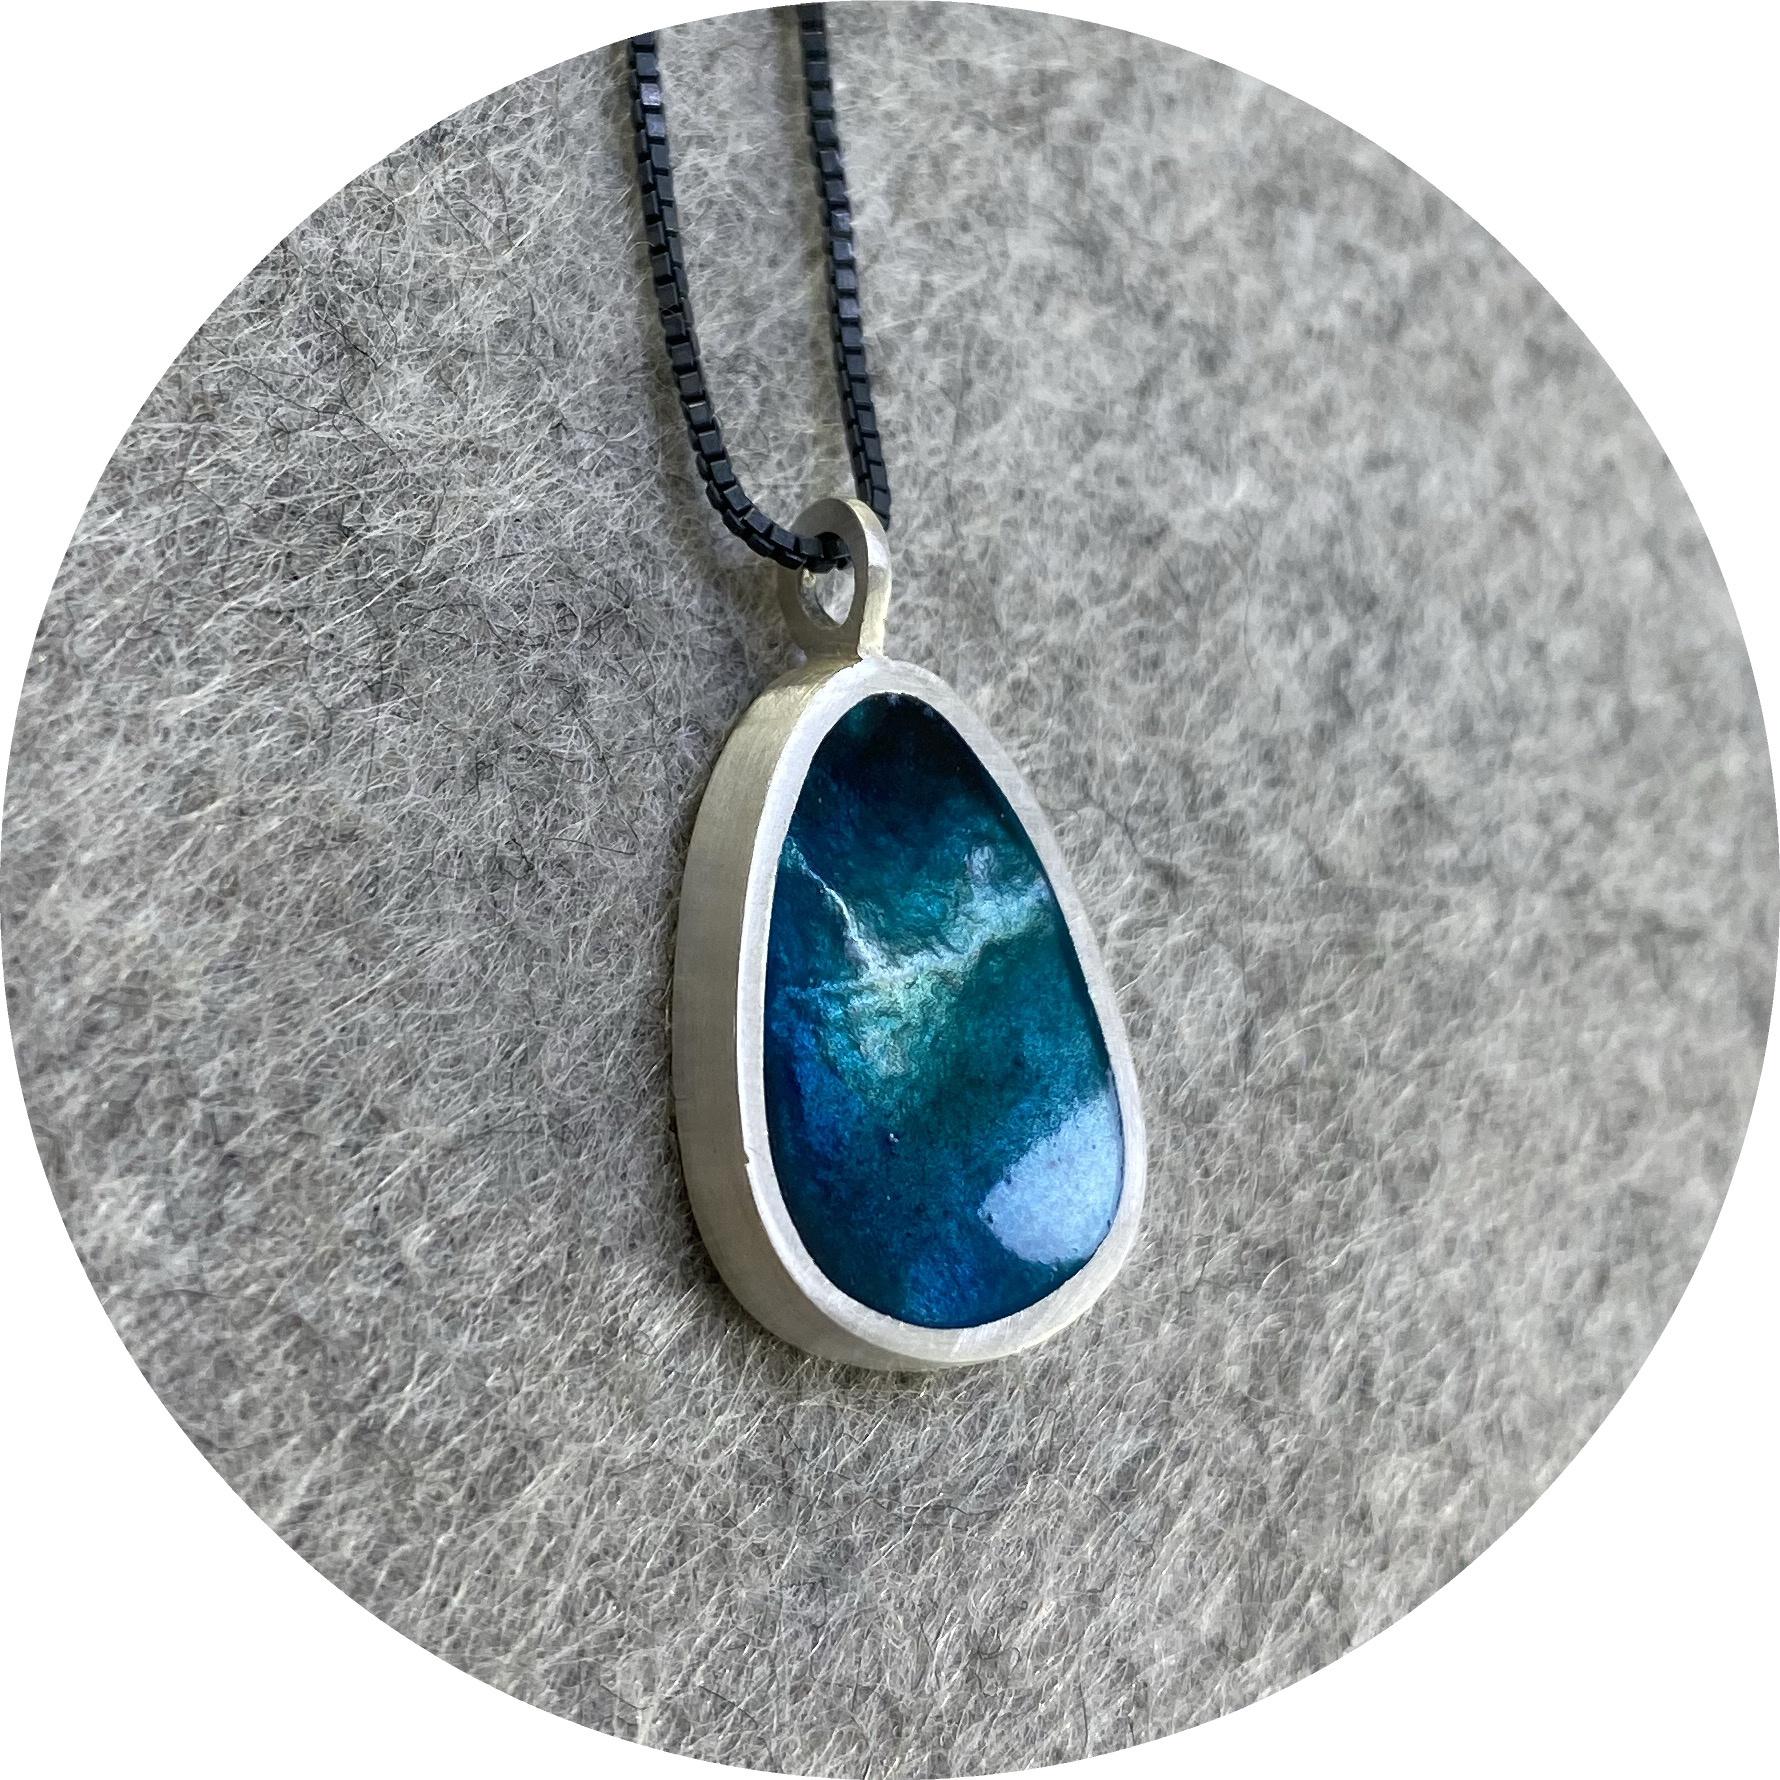 Robyn Clarke- Small retic enamel pendant on oxidised box chain.